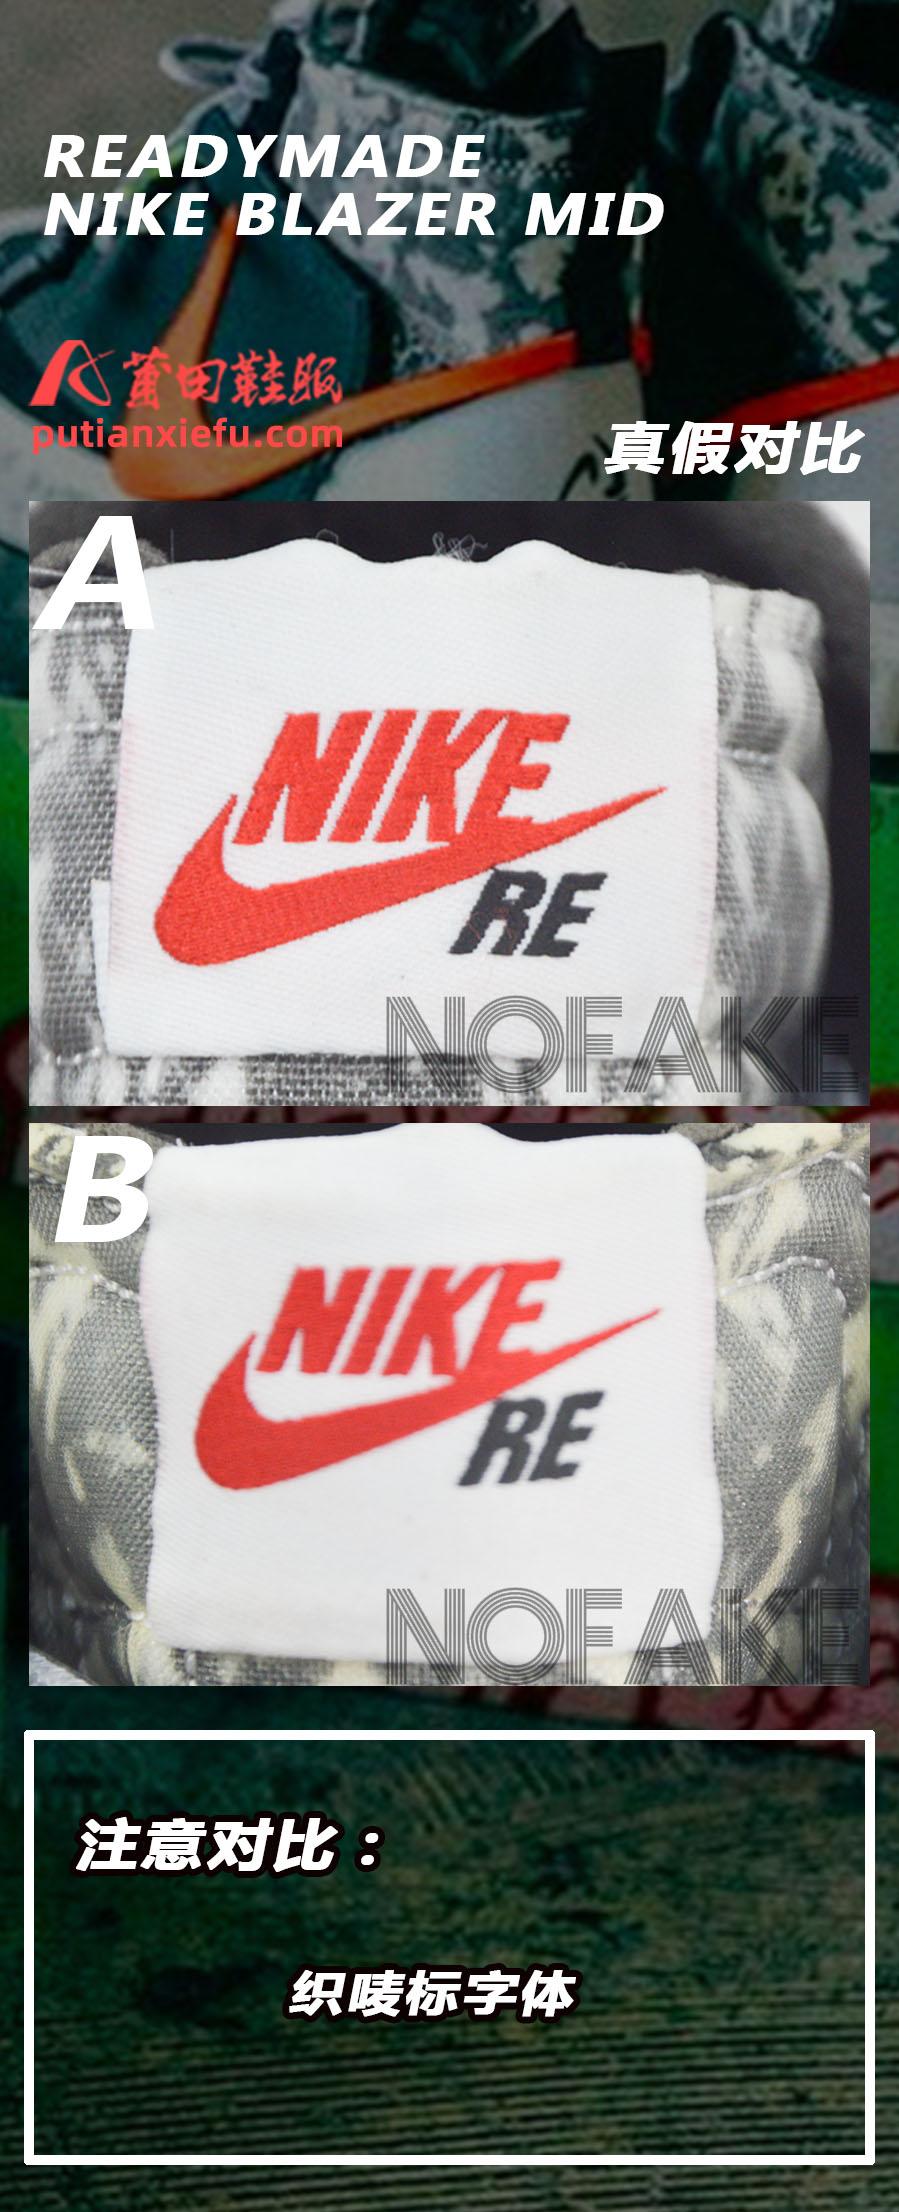 READYMADE x Nike Blazer Mid 黑橙 解构 真假对比